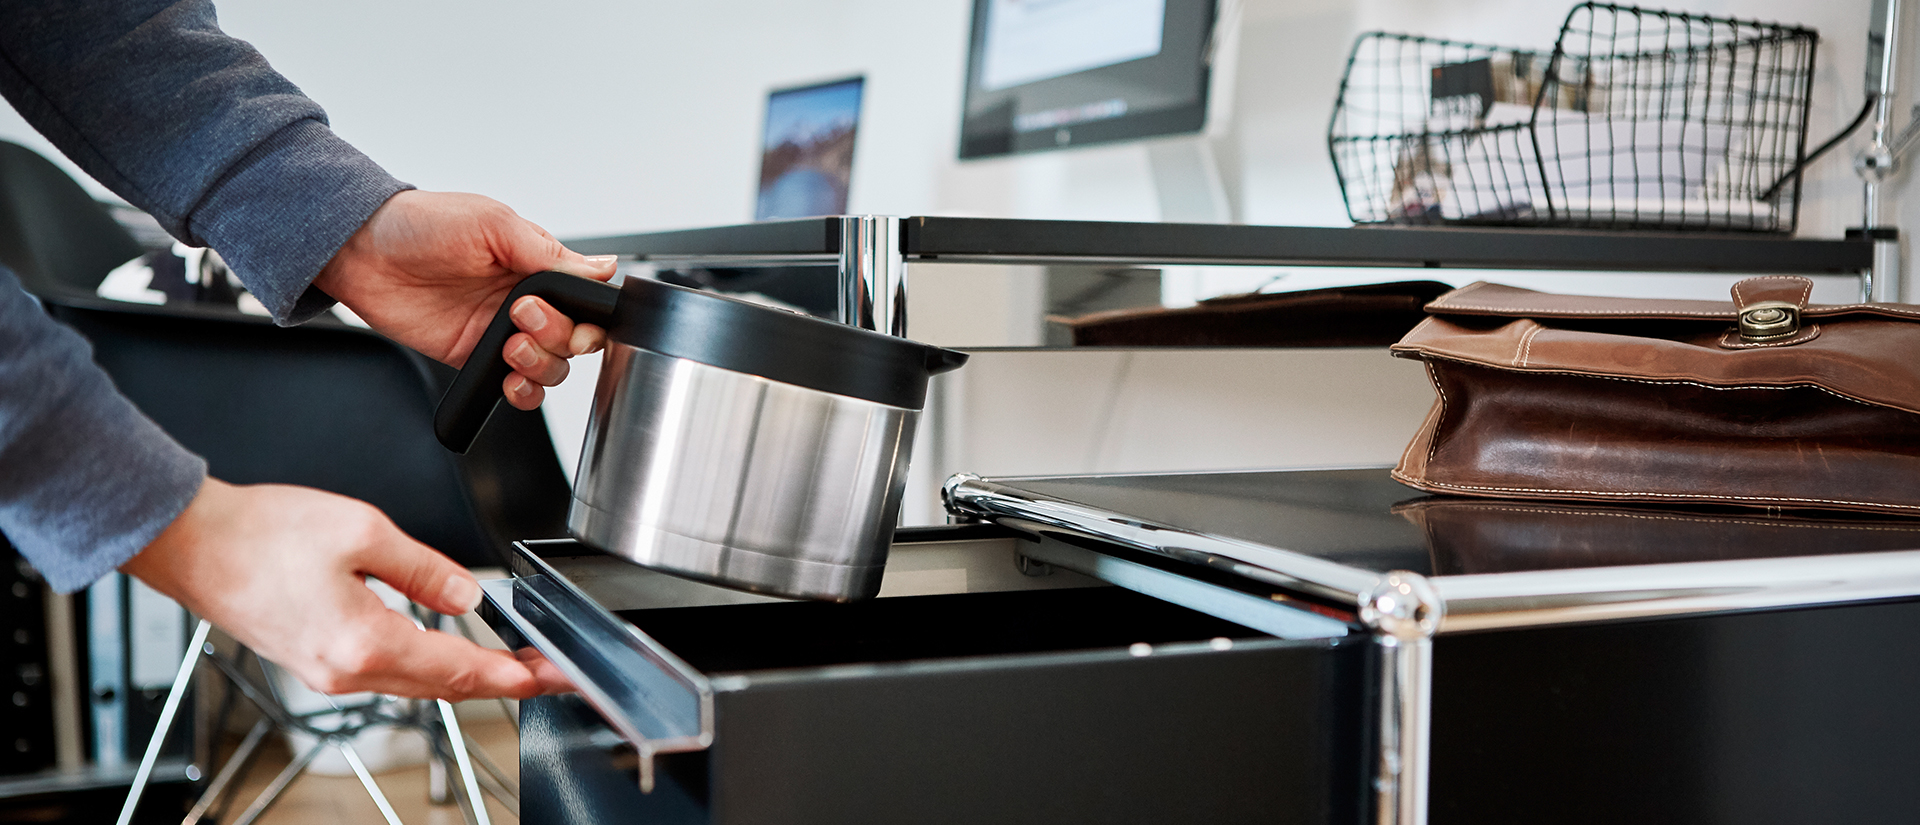 isolierkanne-brueher-kaffee-filterkaffe-niedrig